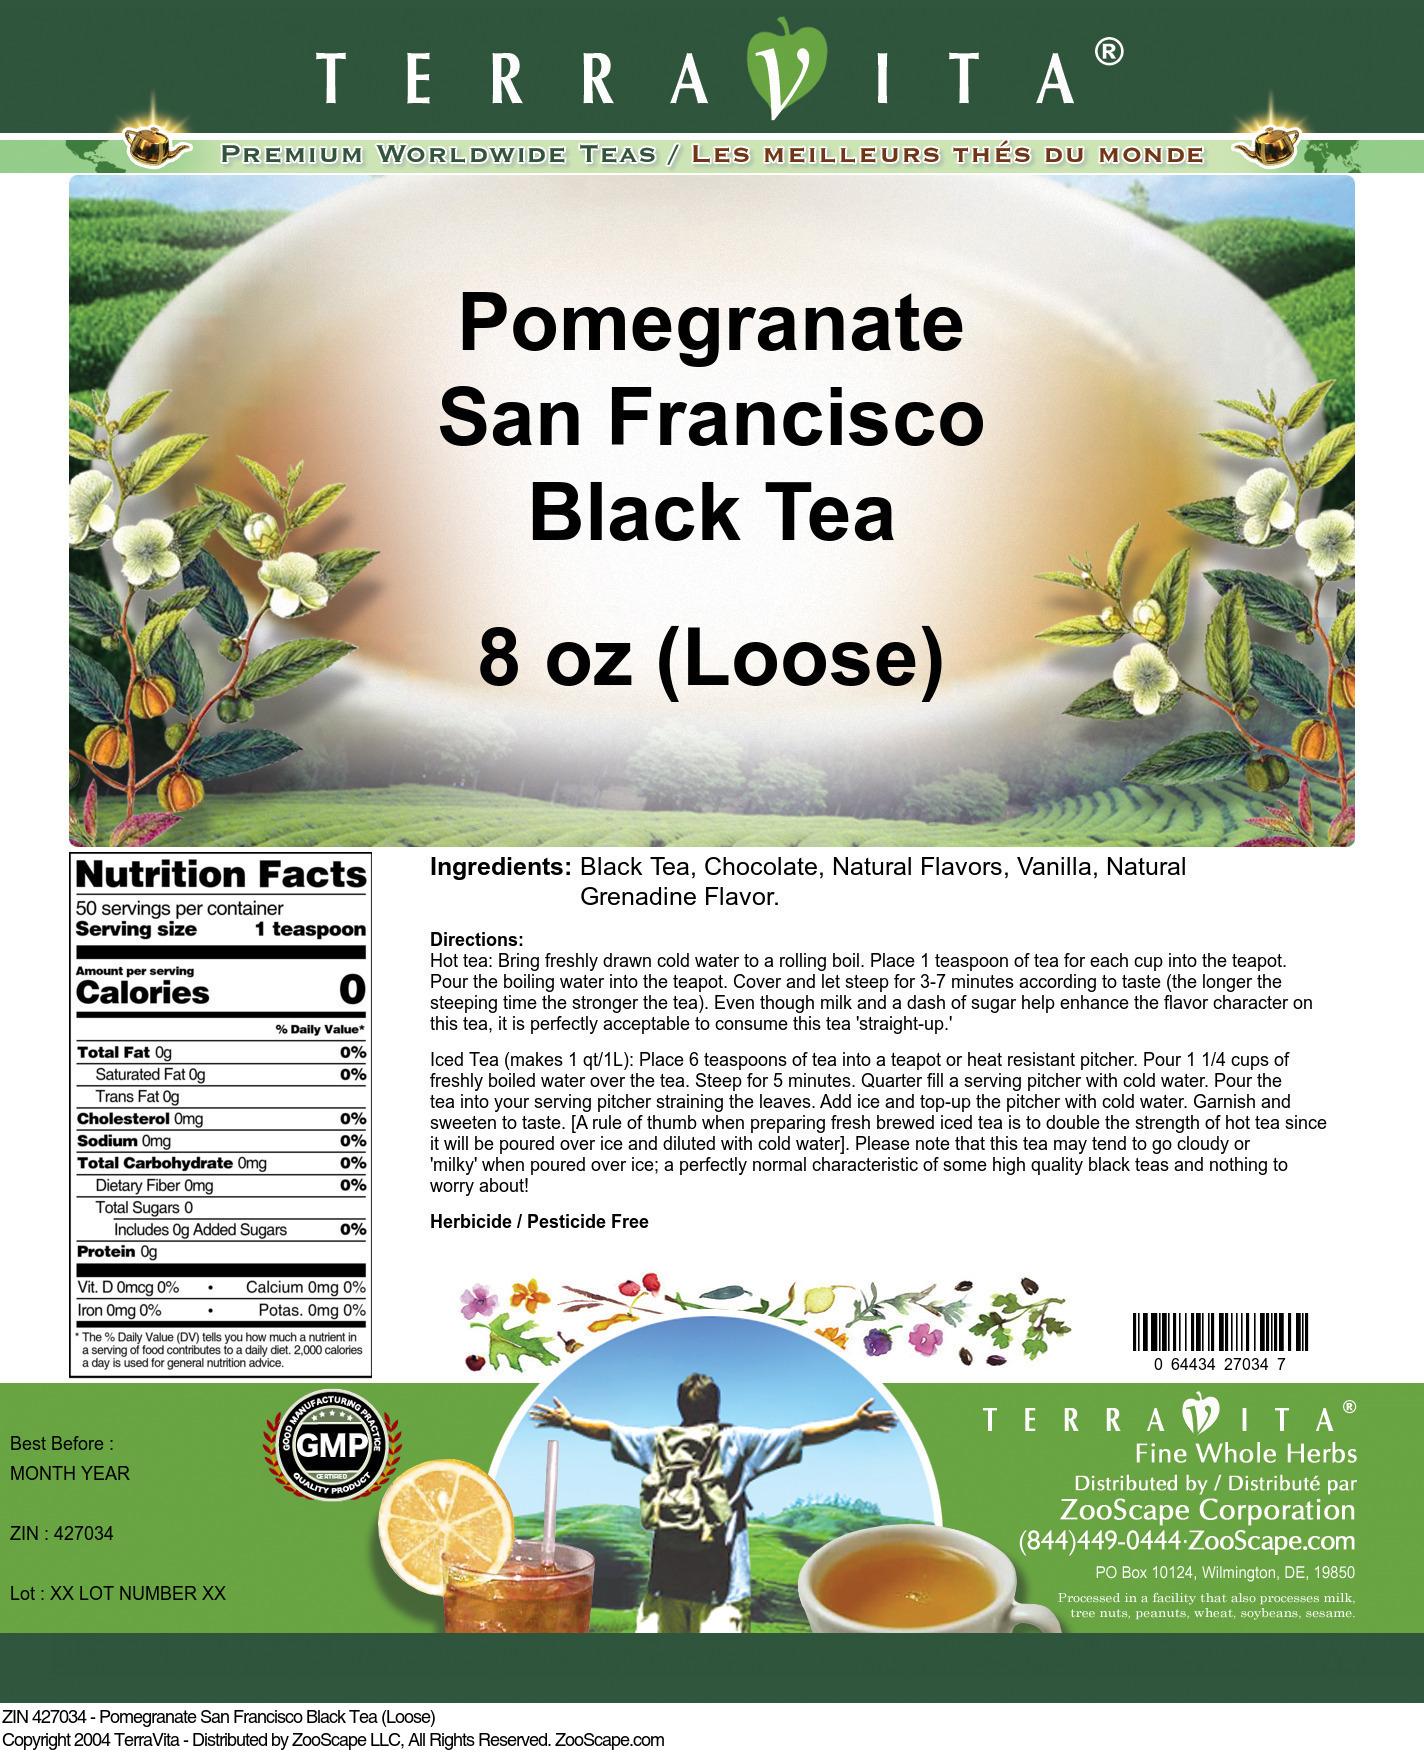 Pomegranate San Francisco Black Tea (Loose)